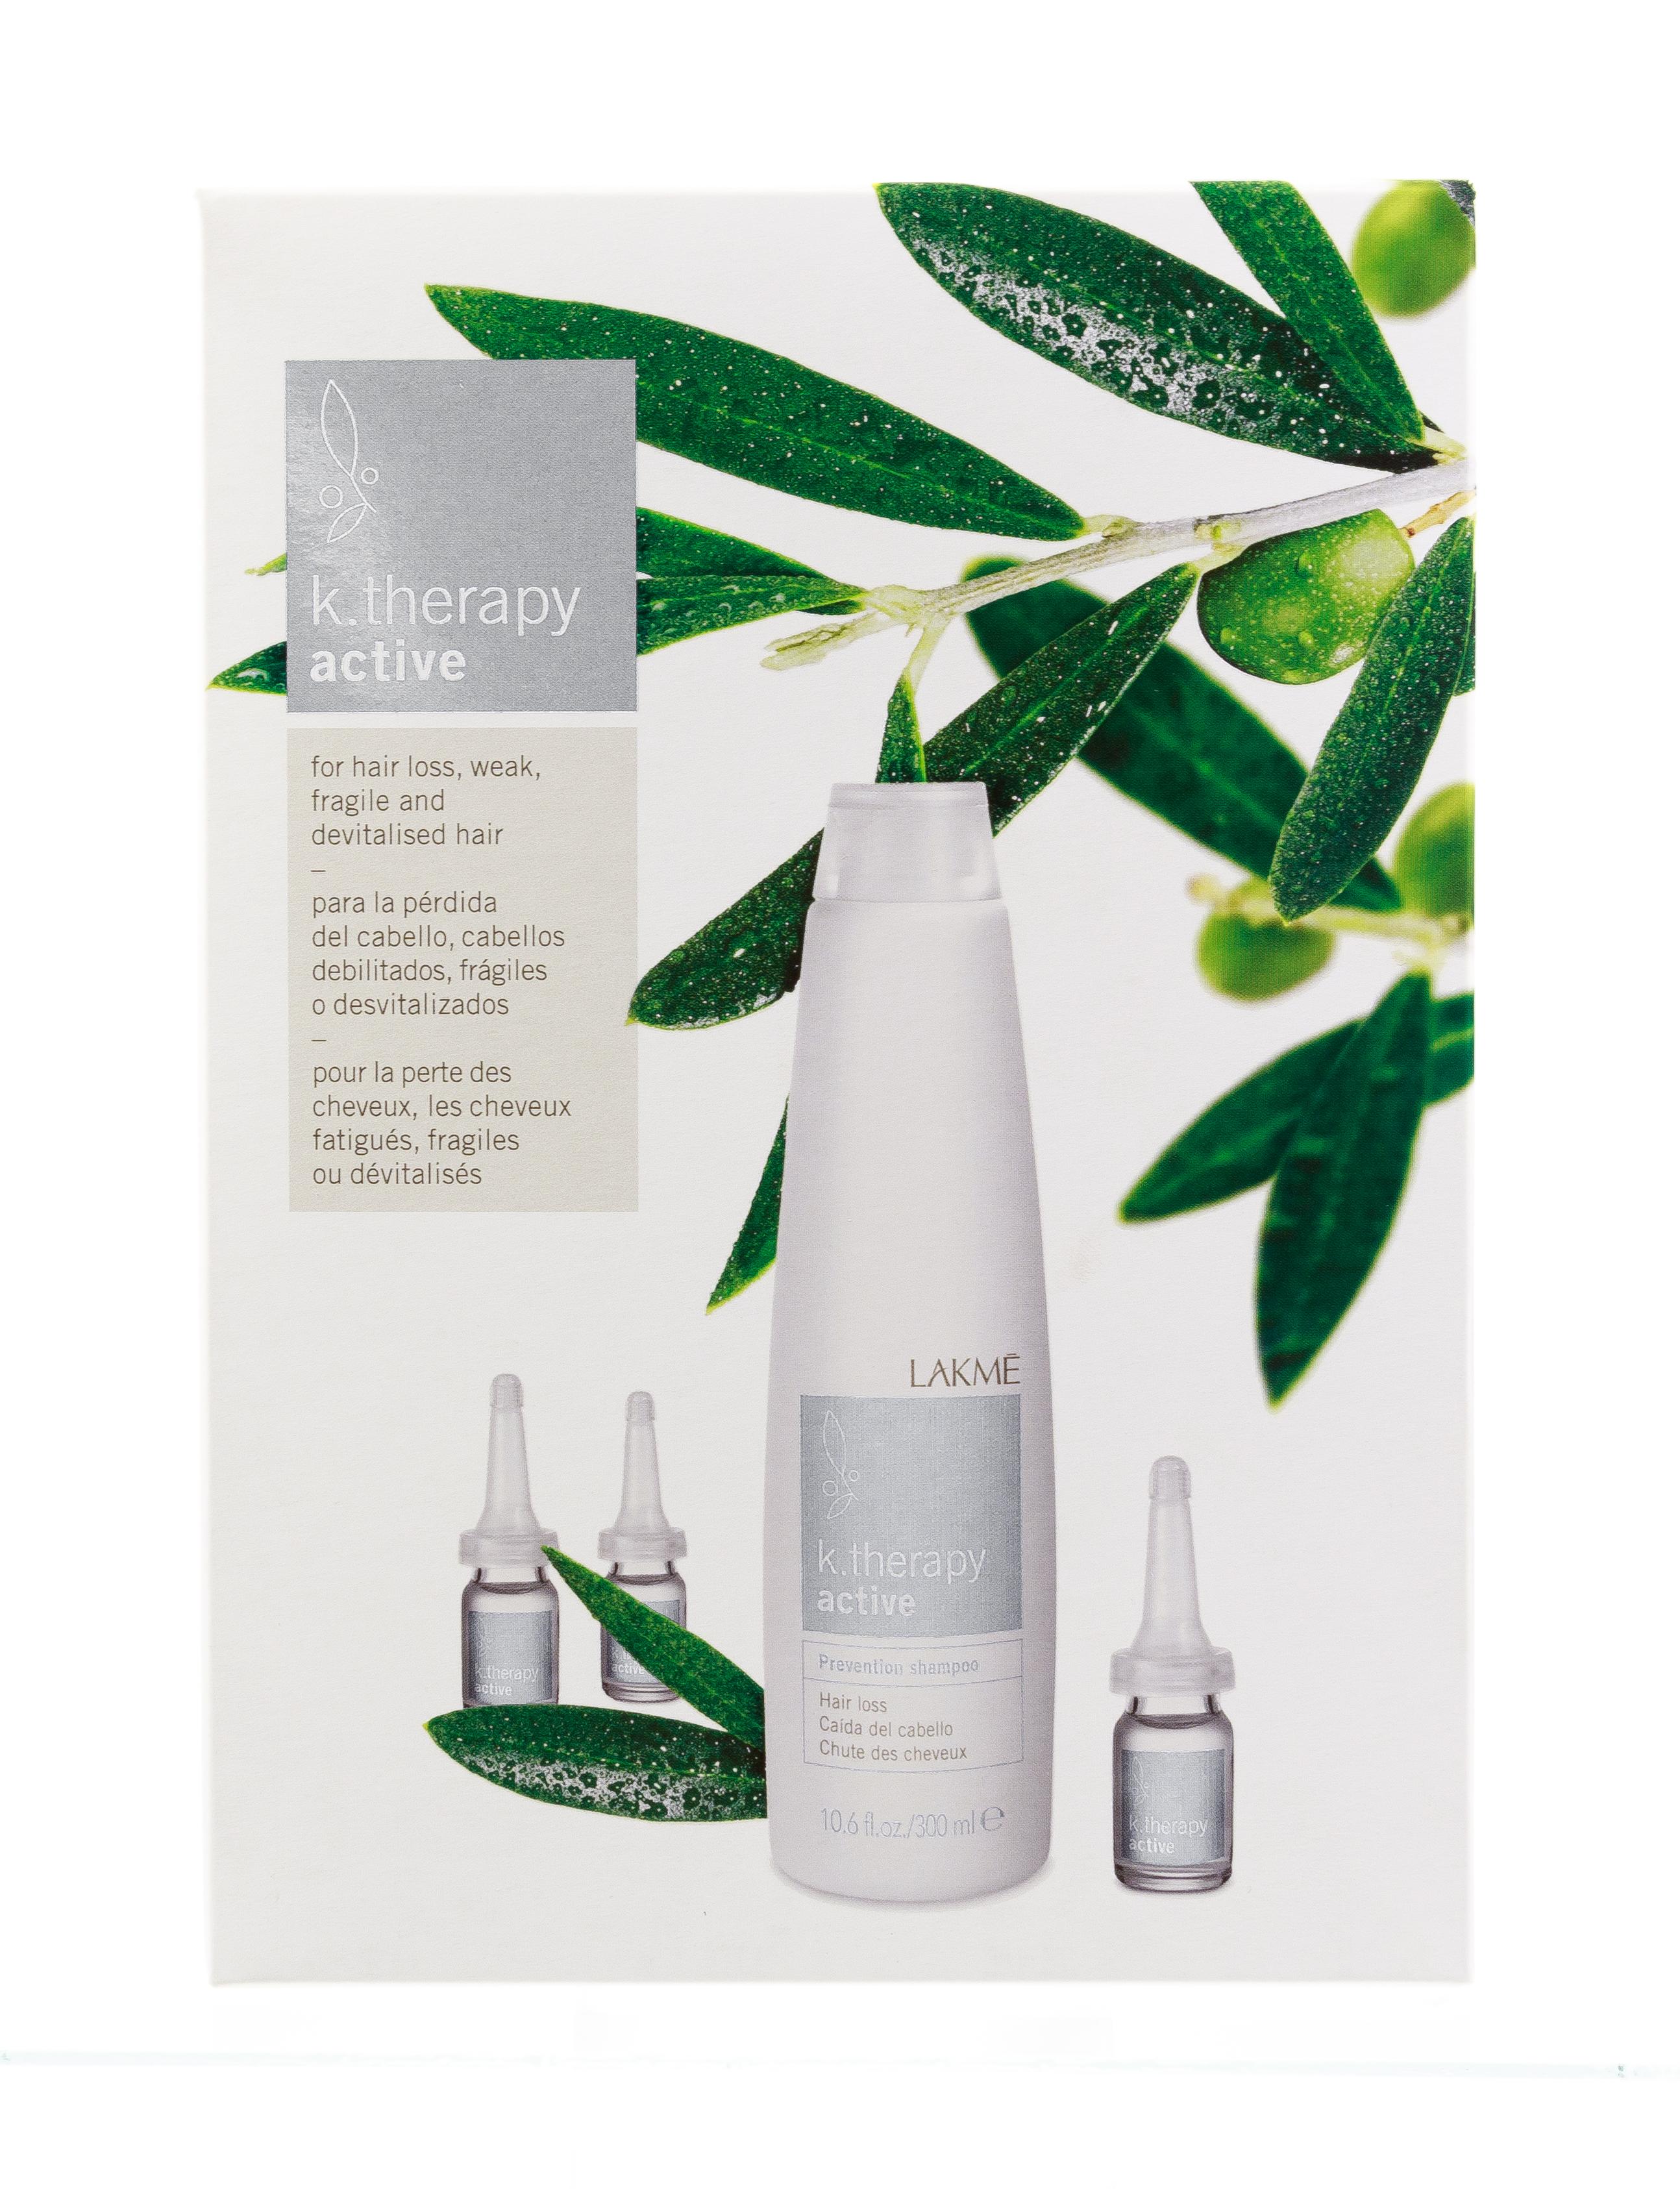 LAKME Набор для укрепления и роста волос (шампунь 300 мл, ампулы 8 х 6 мл) K.Therapy Active Pack